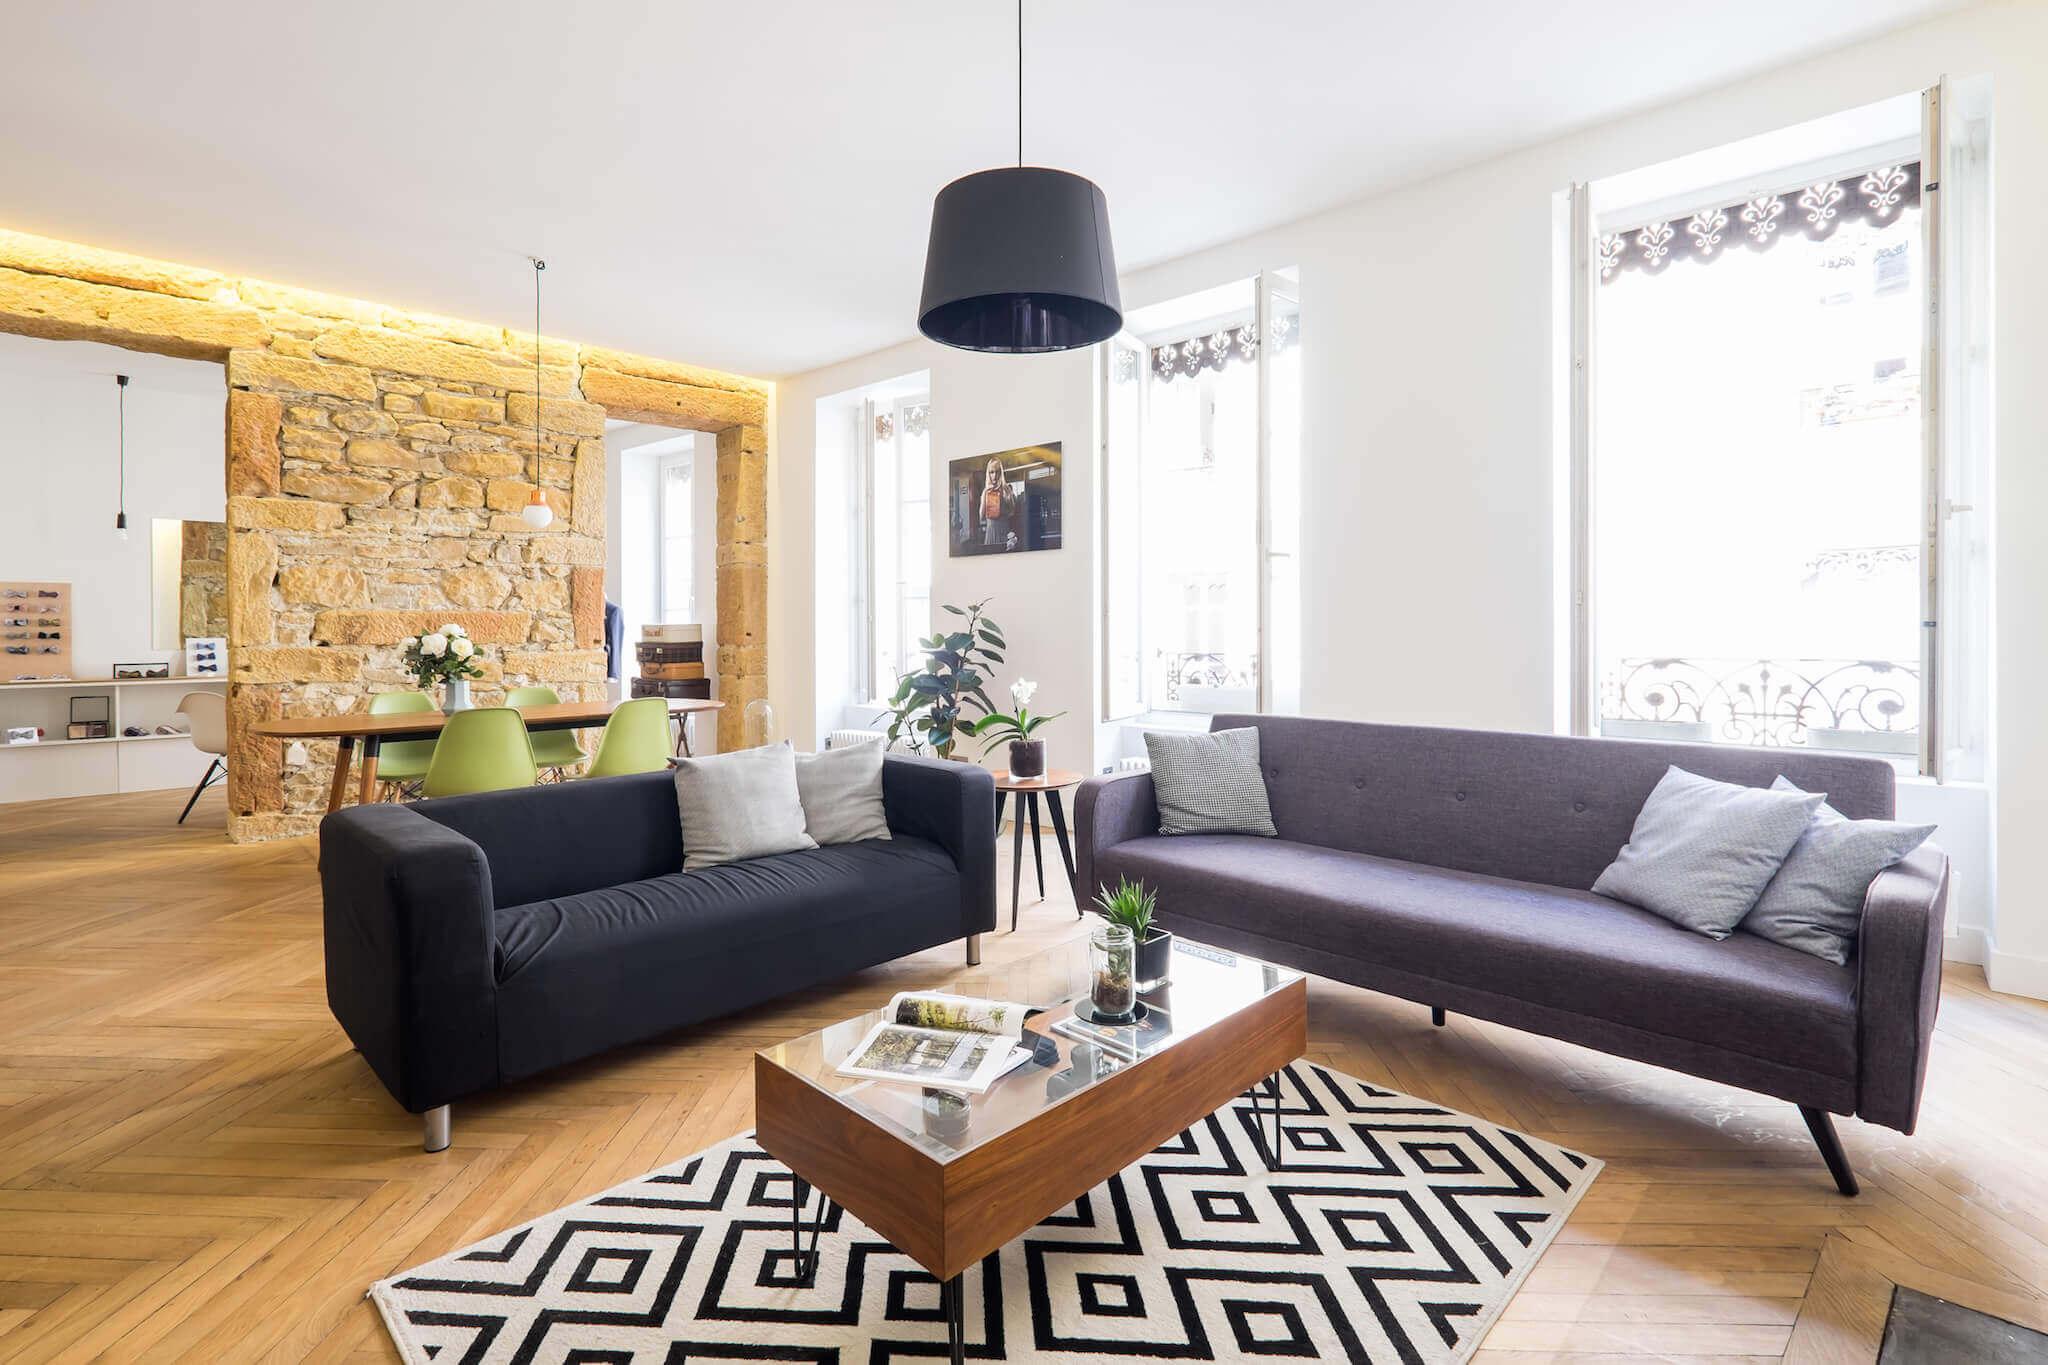 bumper-vendu-appartement-maison-immobilier11.jpg